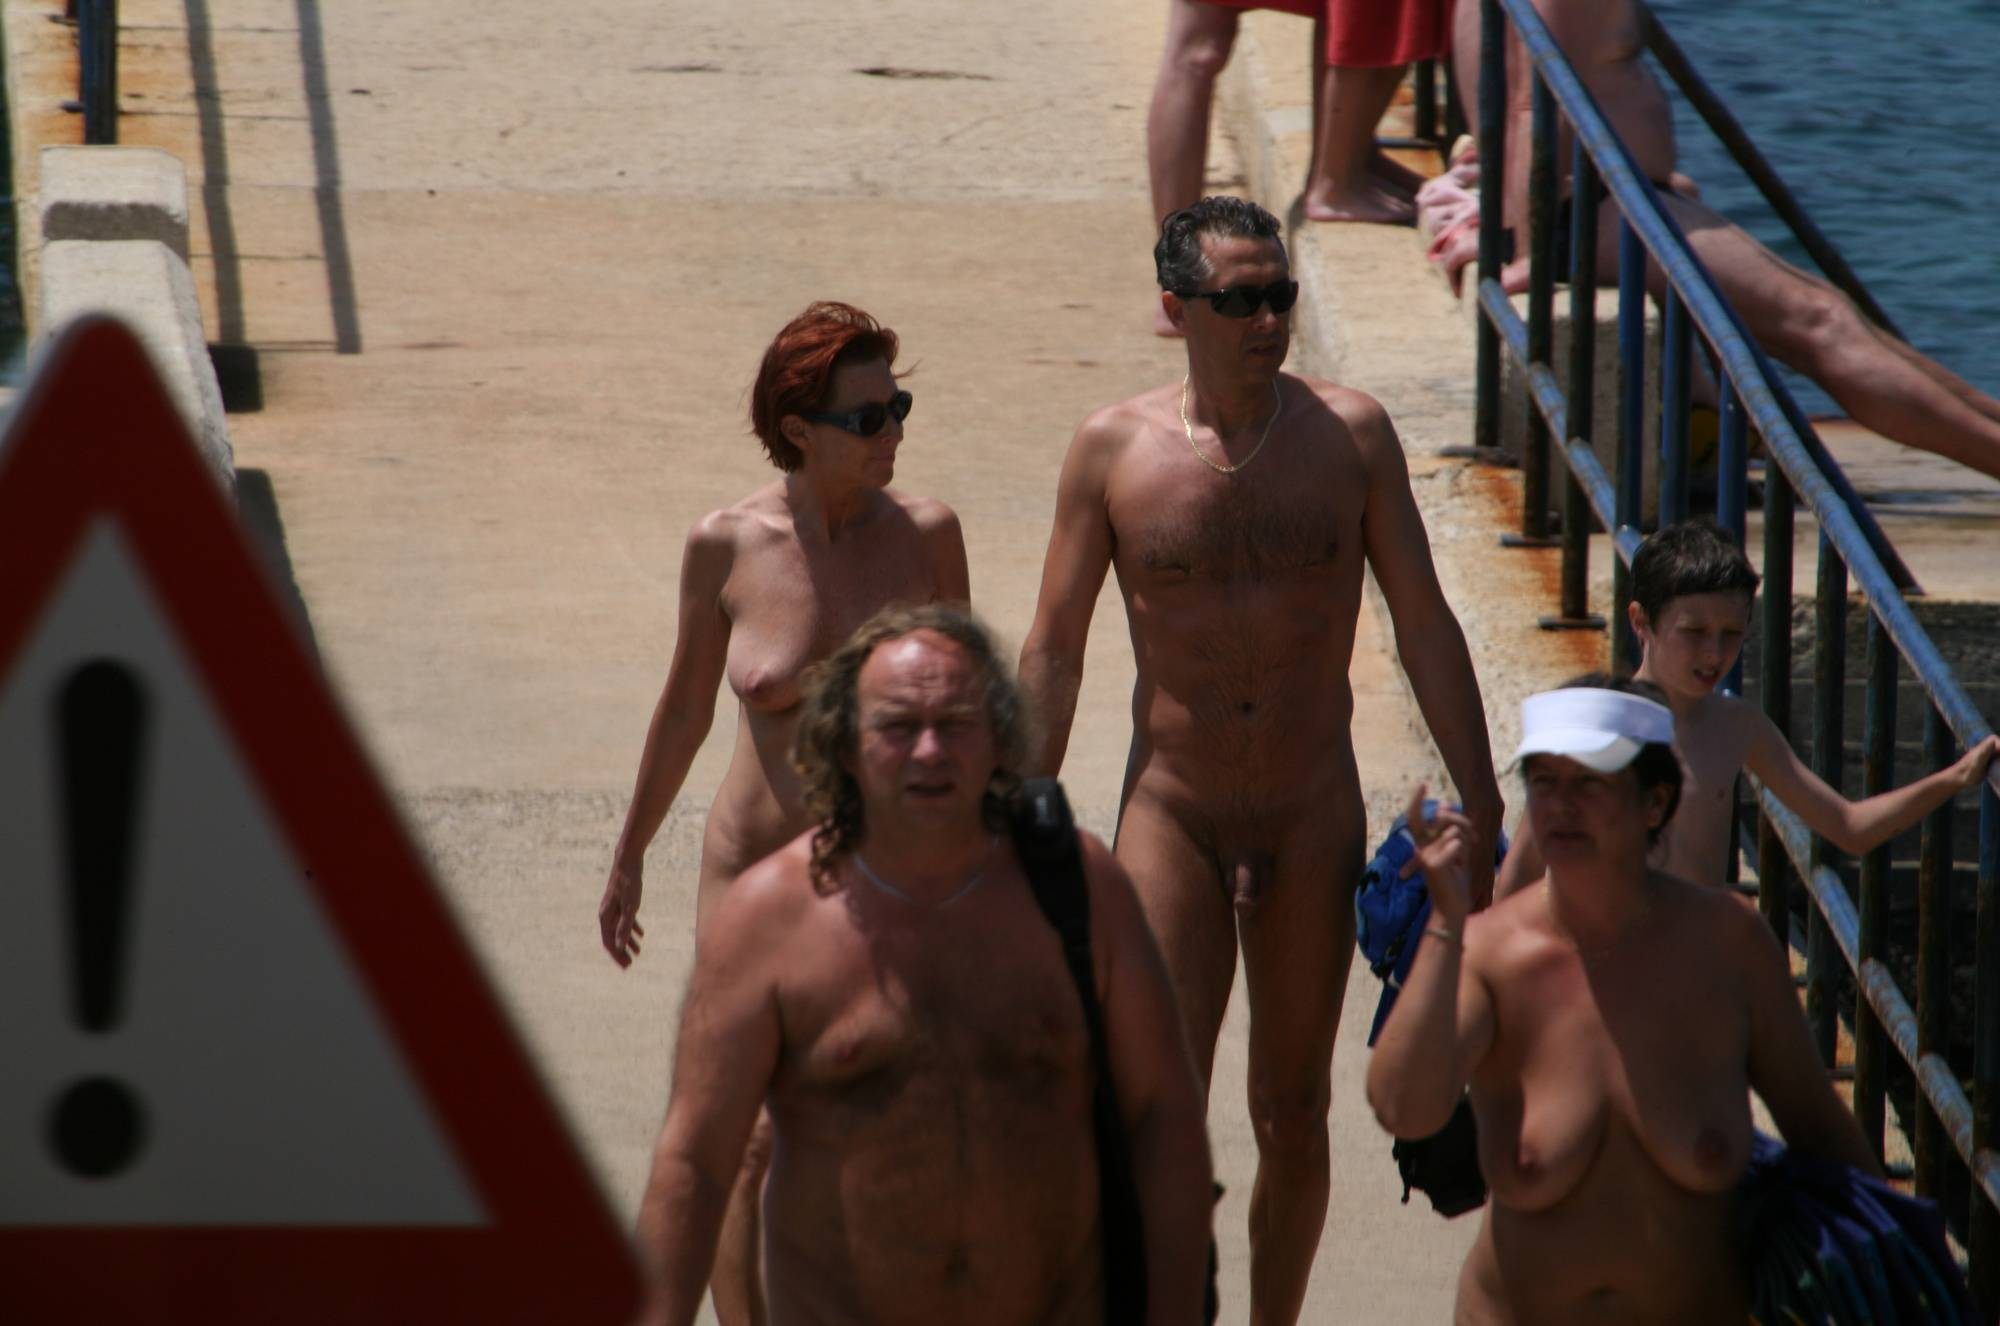 Nudist Pics Coastal Bridge Families - 1